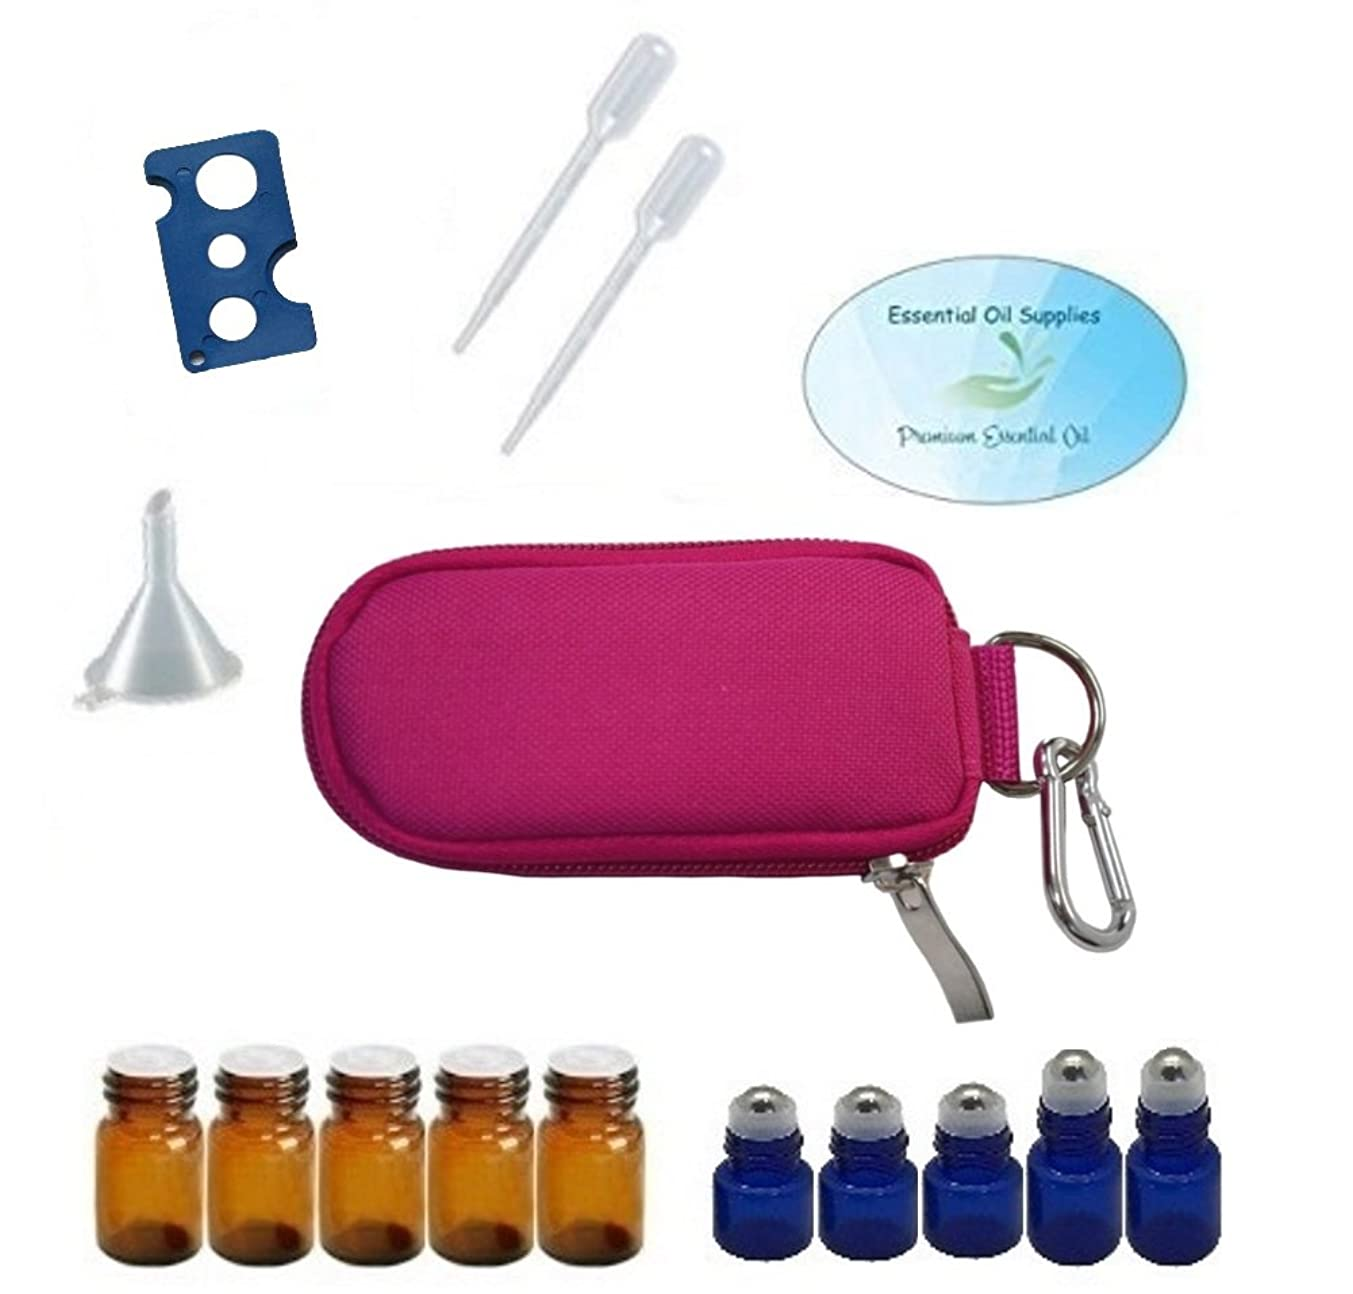 10 Bottle Essential Oil Padded Keychain Carrying Case Travel Bag, Roller Bottles and Euro Orifice Reducer Bottles, Bottle Opener, Funnel, Pipettes (Rose Pink)